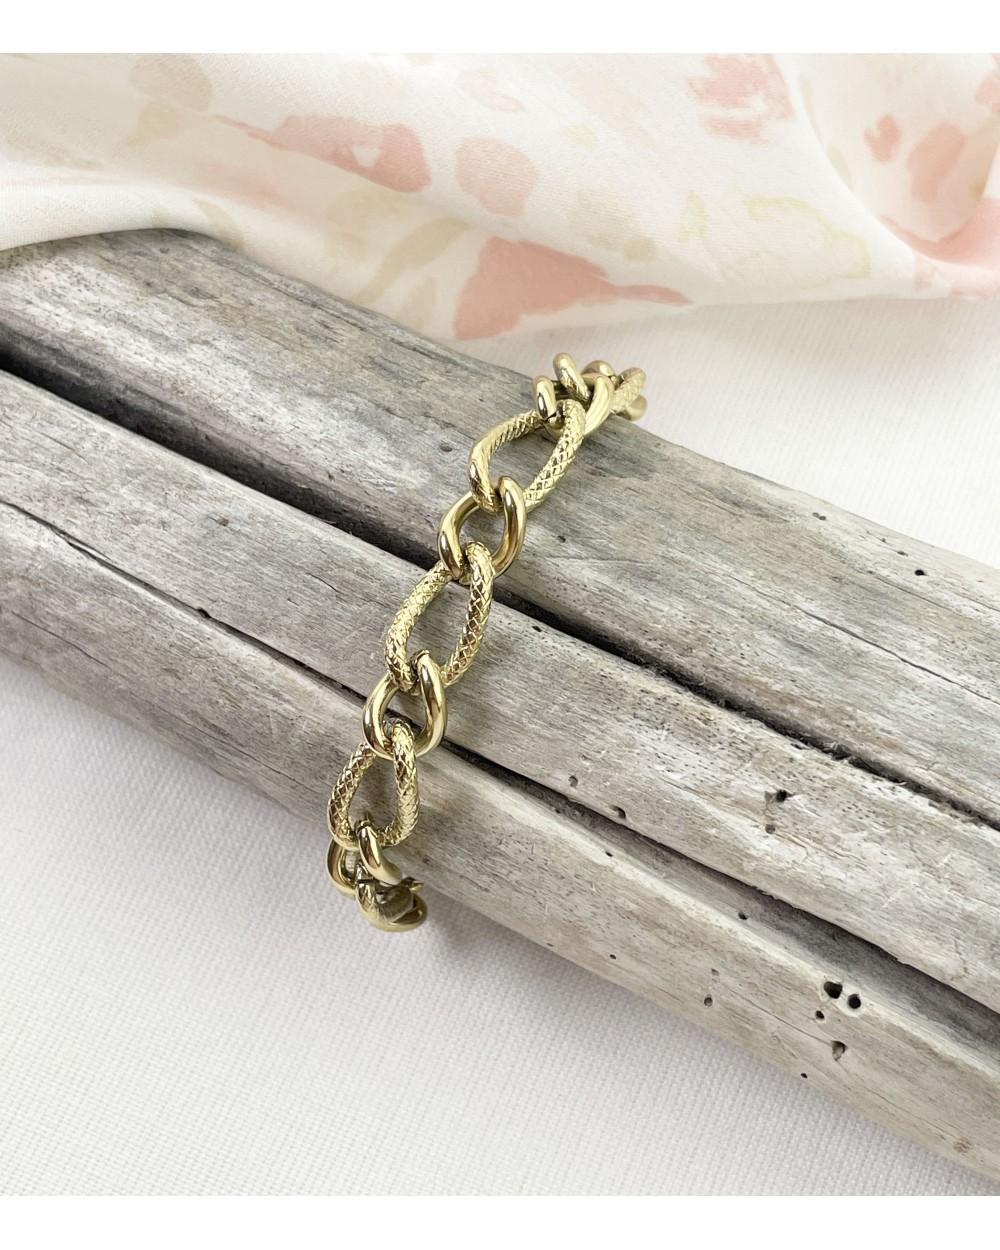 Bracelet Tess - Acier chirurgical - Bracelet chaîne tendance - Bijoux tendance - Paloma Bijoux